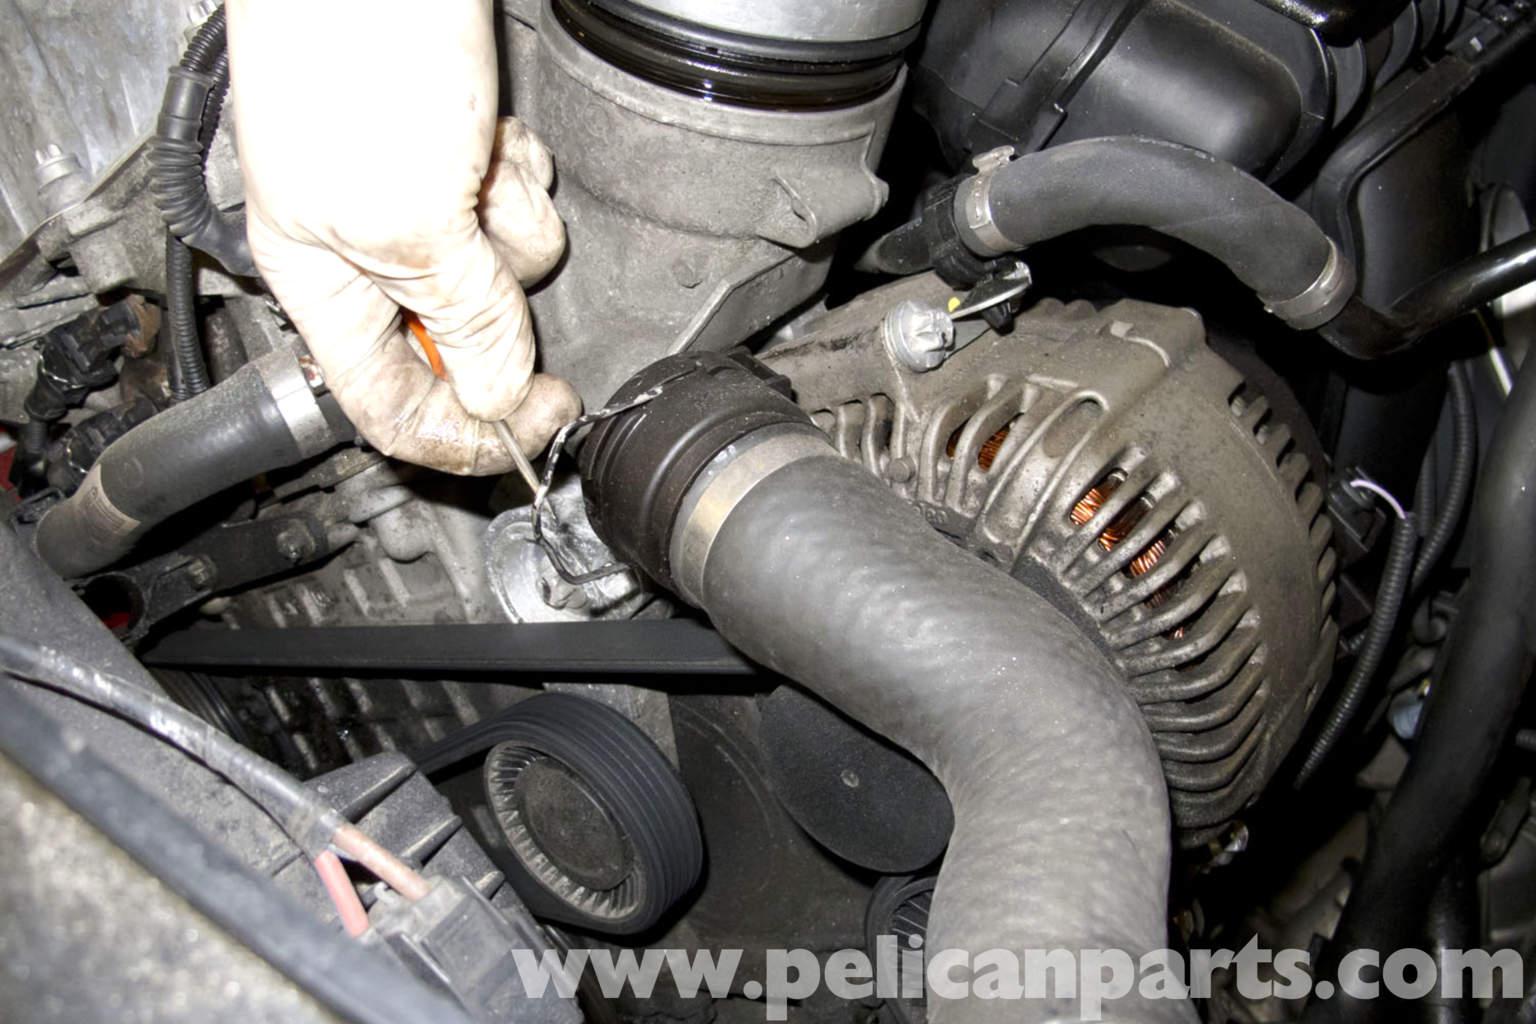 BMW E90 Oil Filter Housing Gasket Replacement | E91, E92, E93 | Pelican Parts DIY Maintenance ...